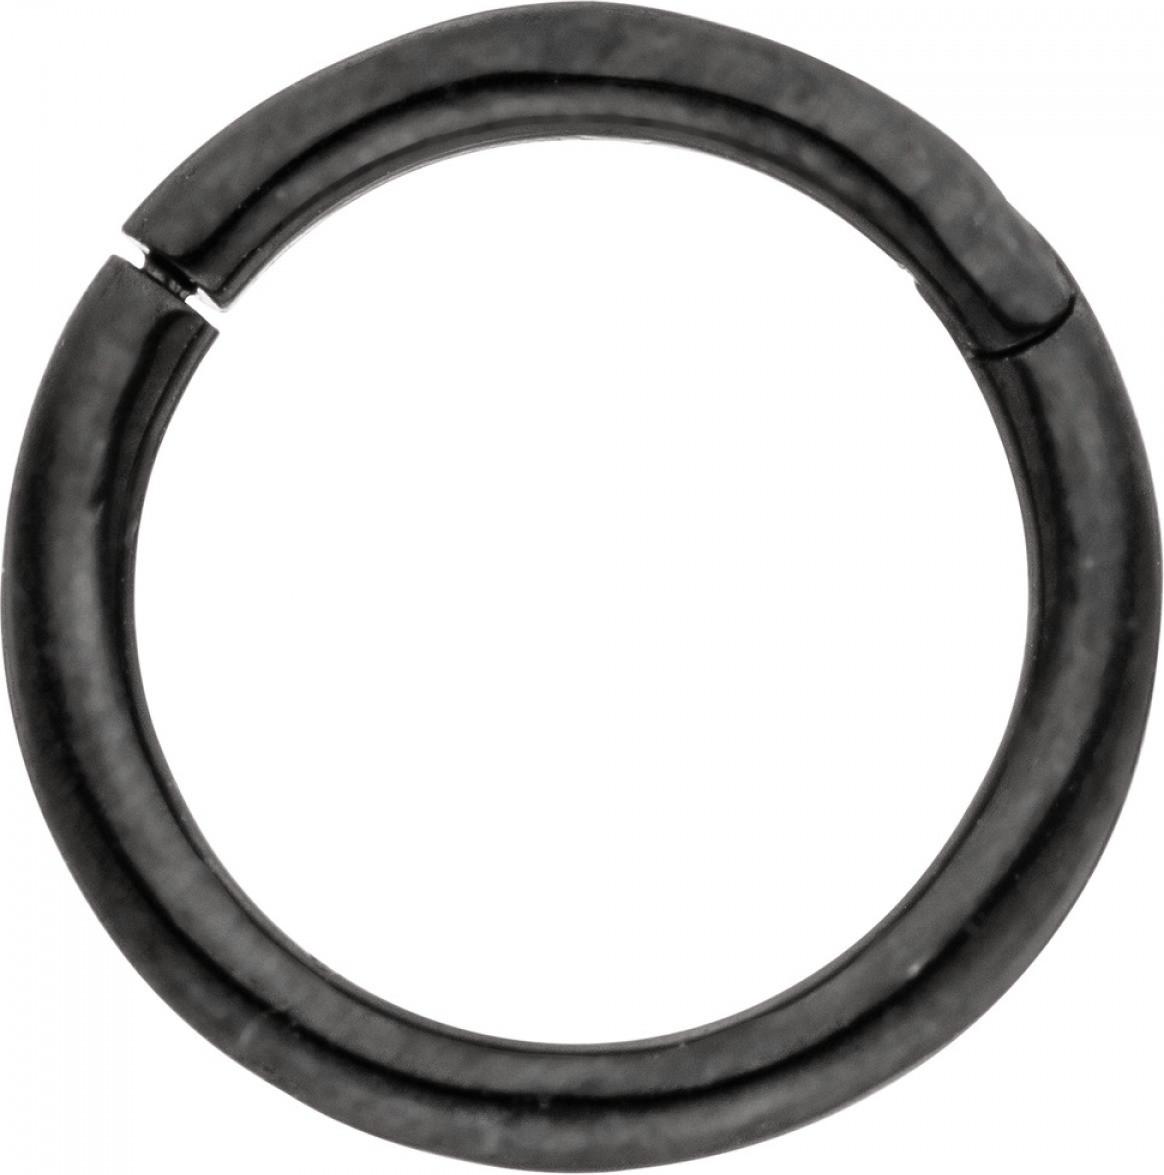 JOBO Segmentring schwarz (47026)